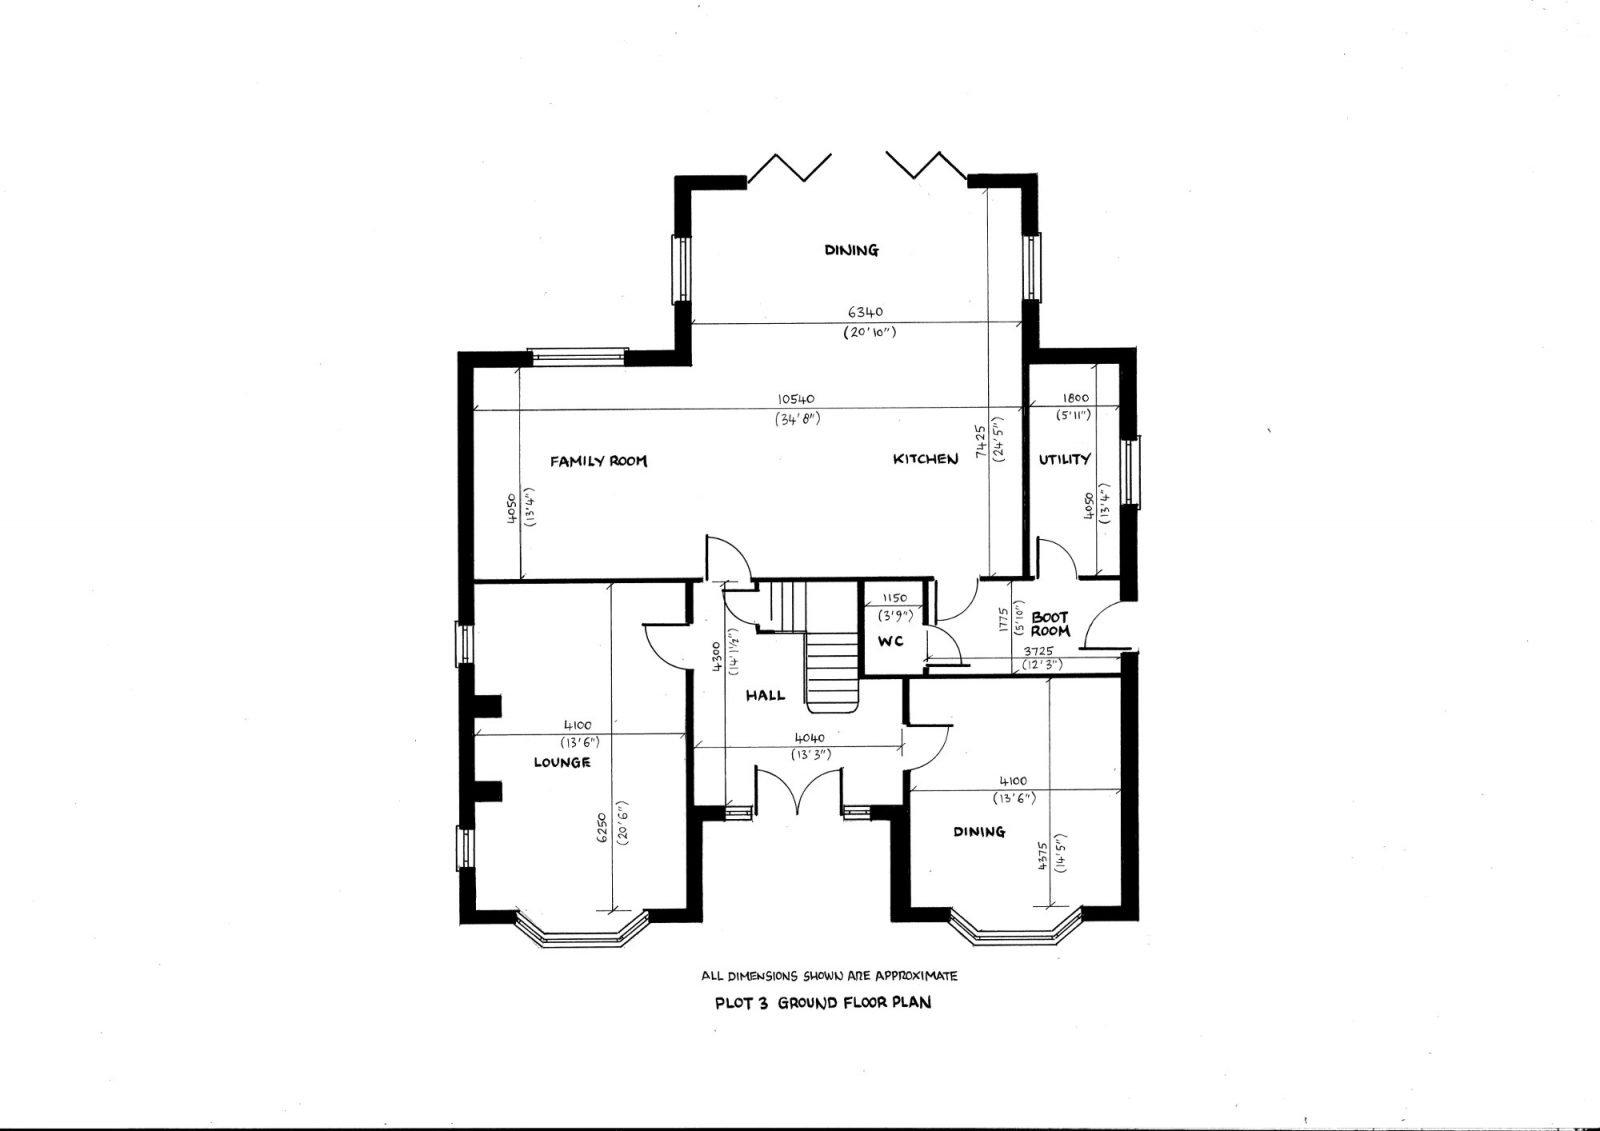 plot-3-ground-floor-plan